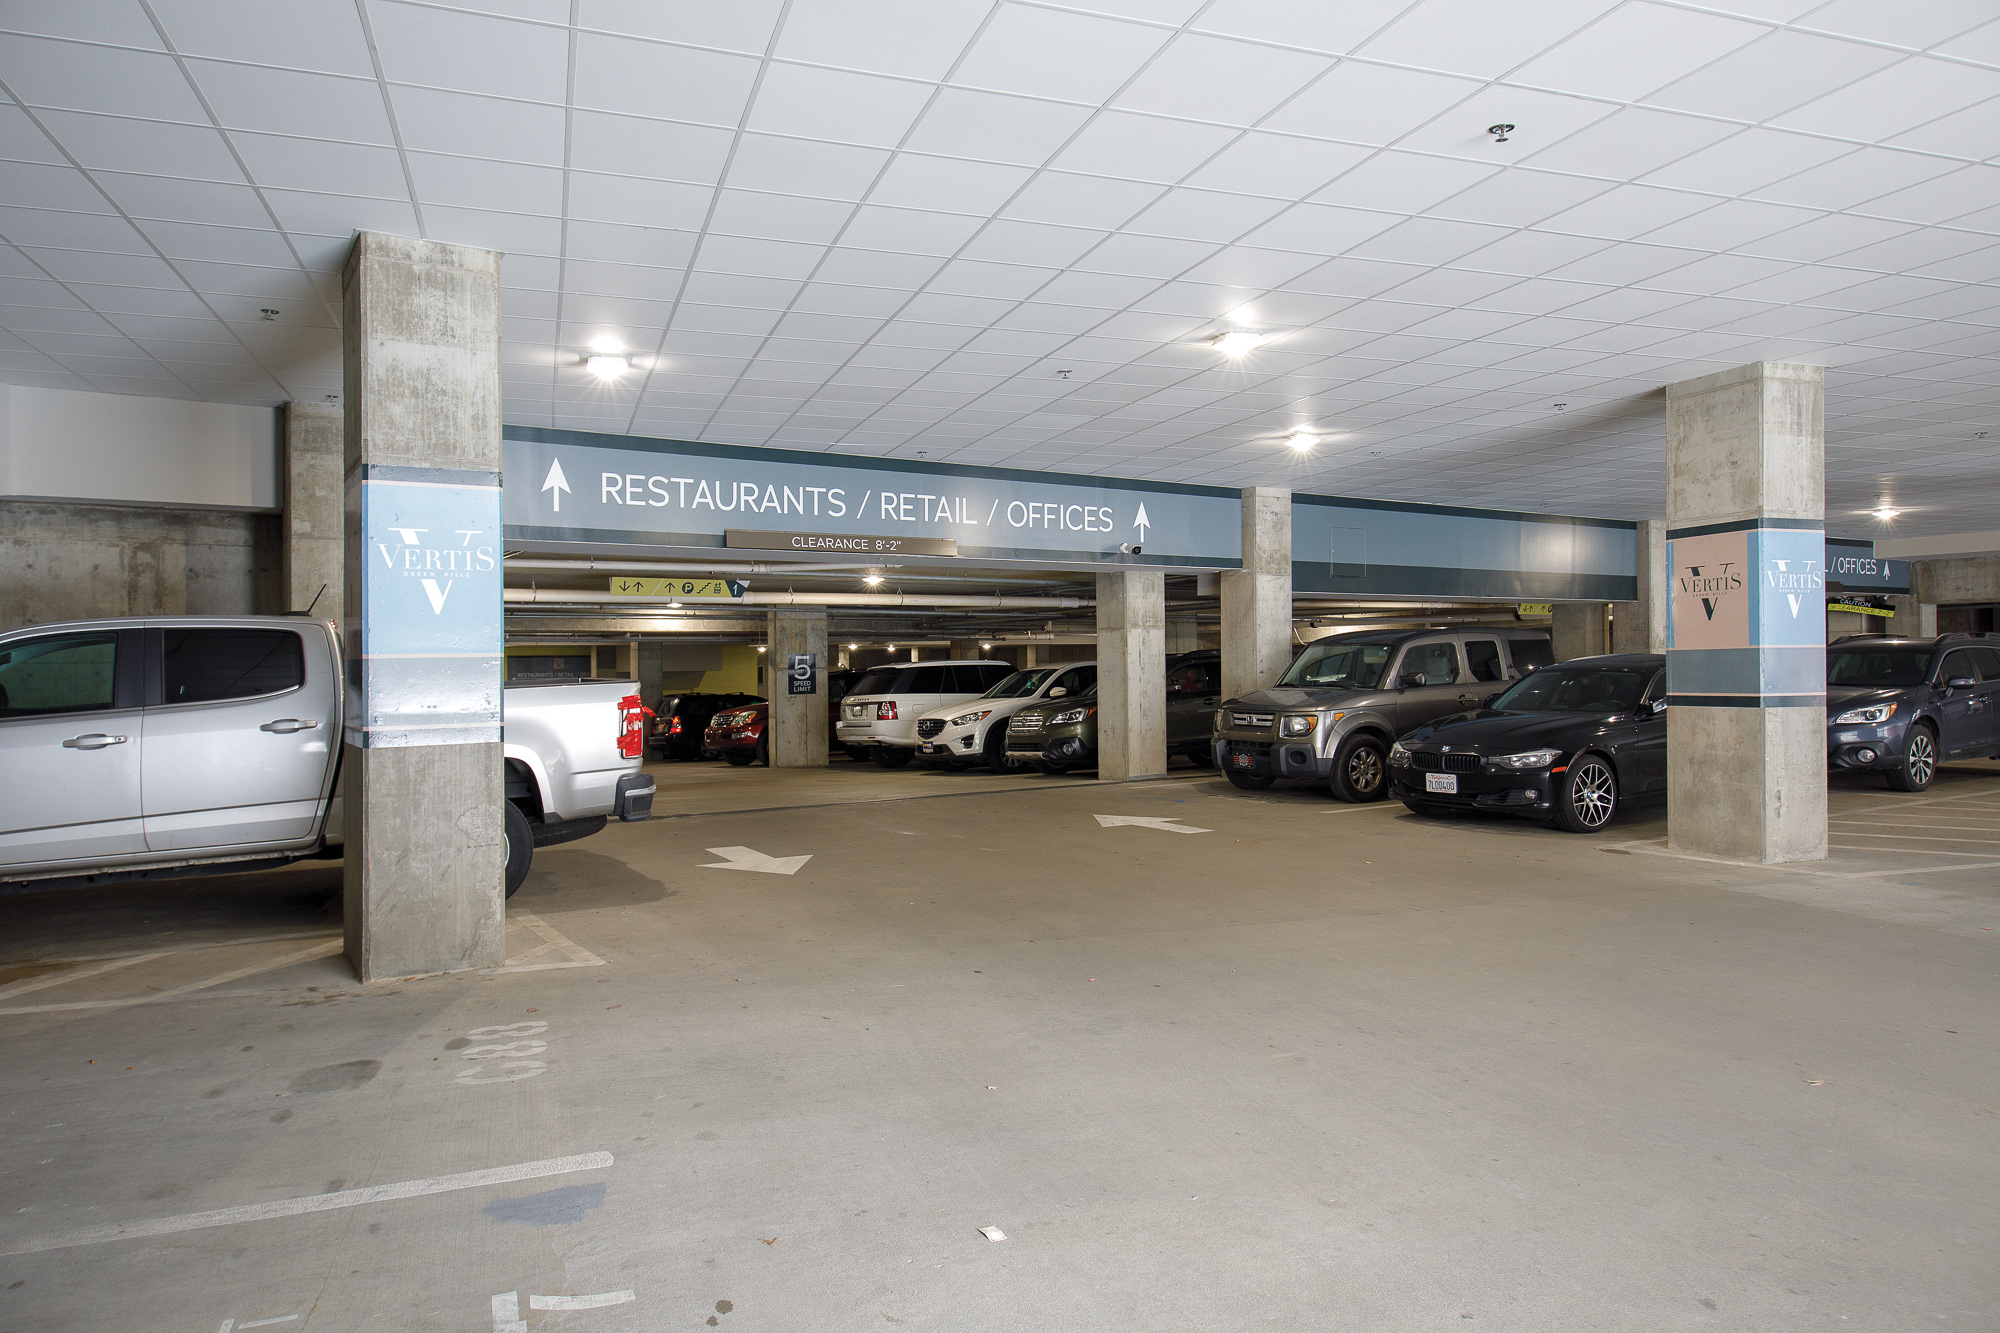 Vertis-Green-Hills_brand-identity-signage_parking-garage_MG_5974_small 2000 px.jpg